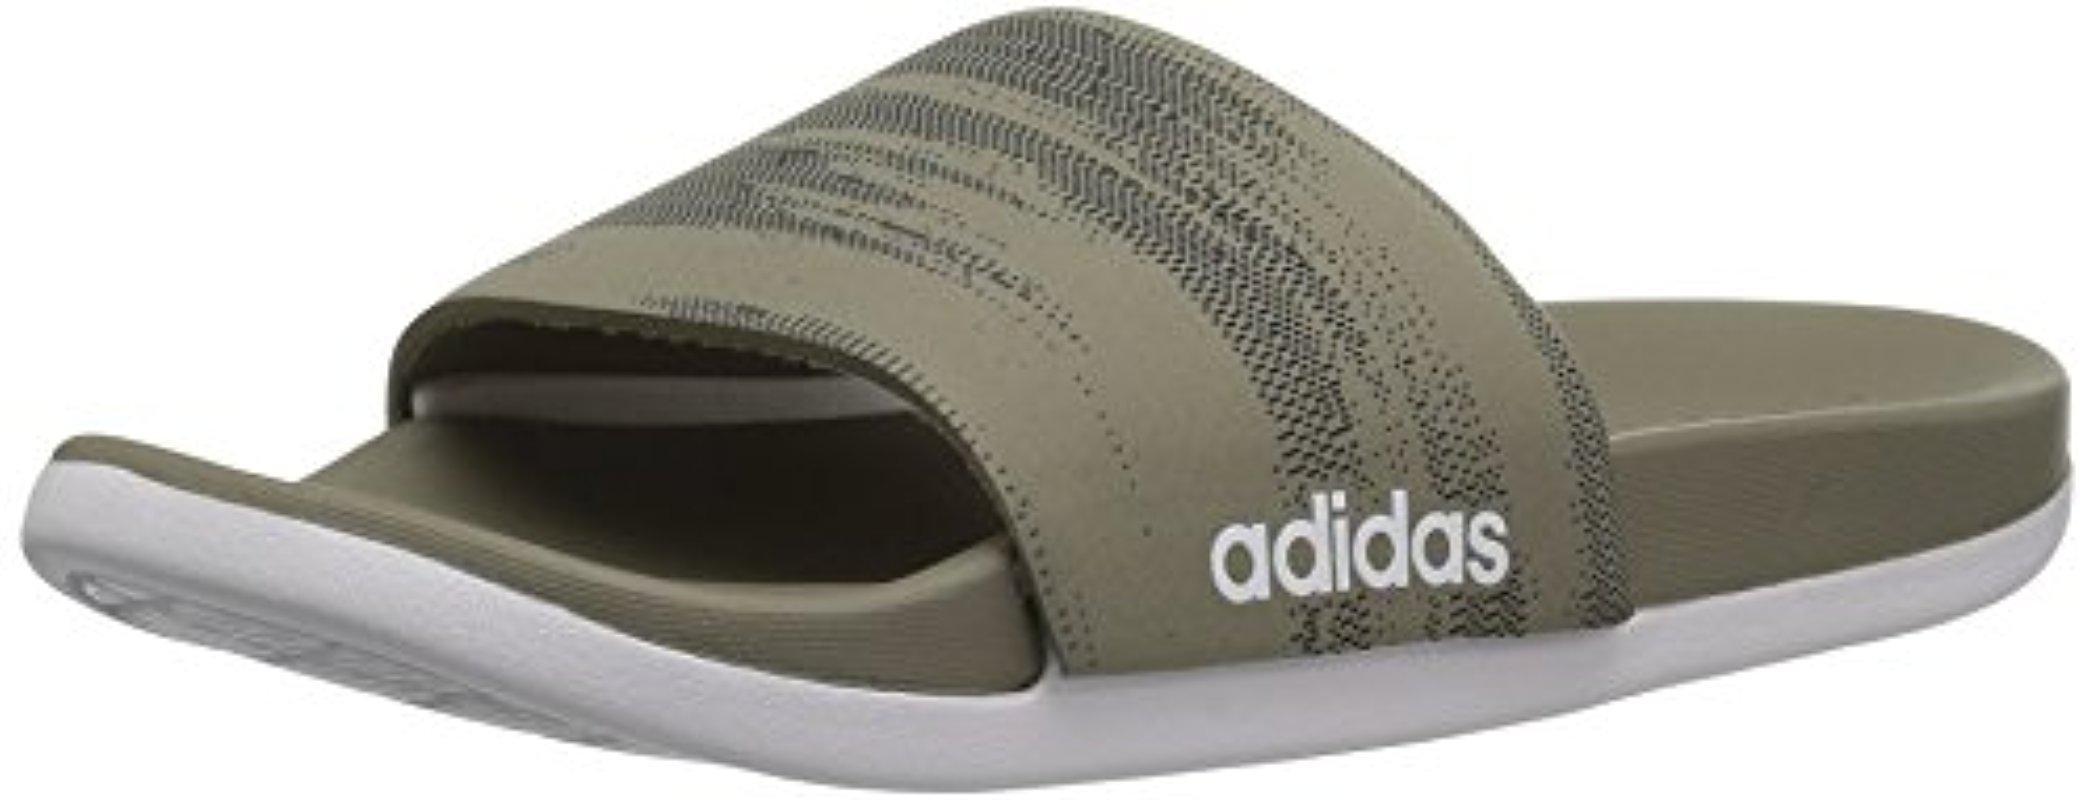 86fa4390d36b Lyst - adidas Originals Adidas Adilette Cf+ Link Gr Slide Sandal ...